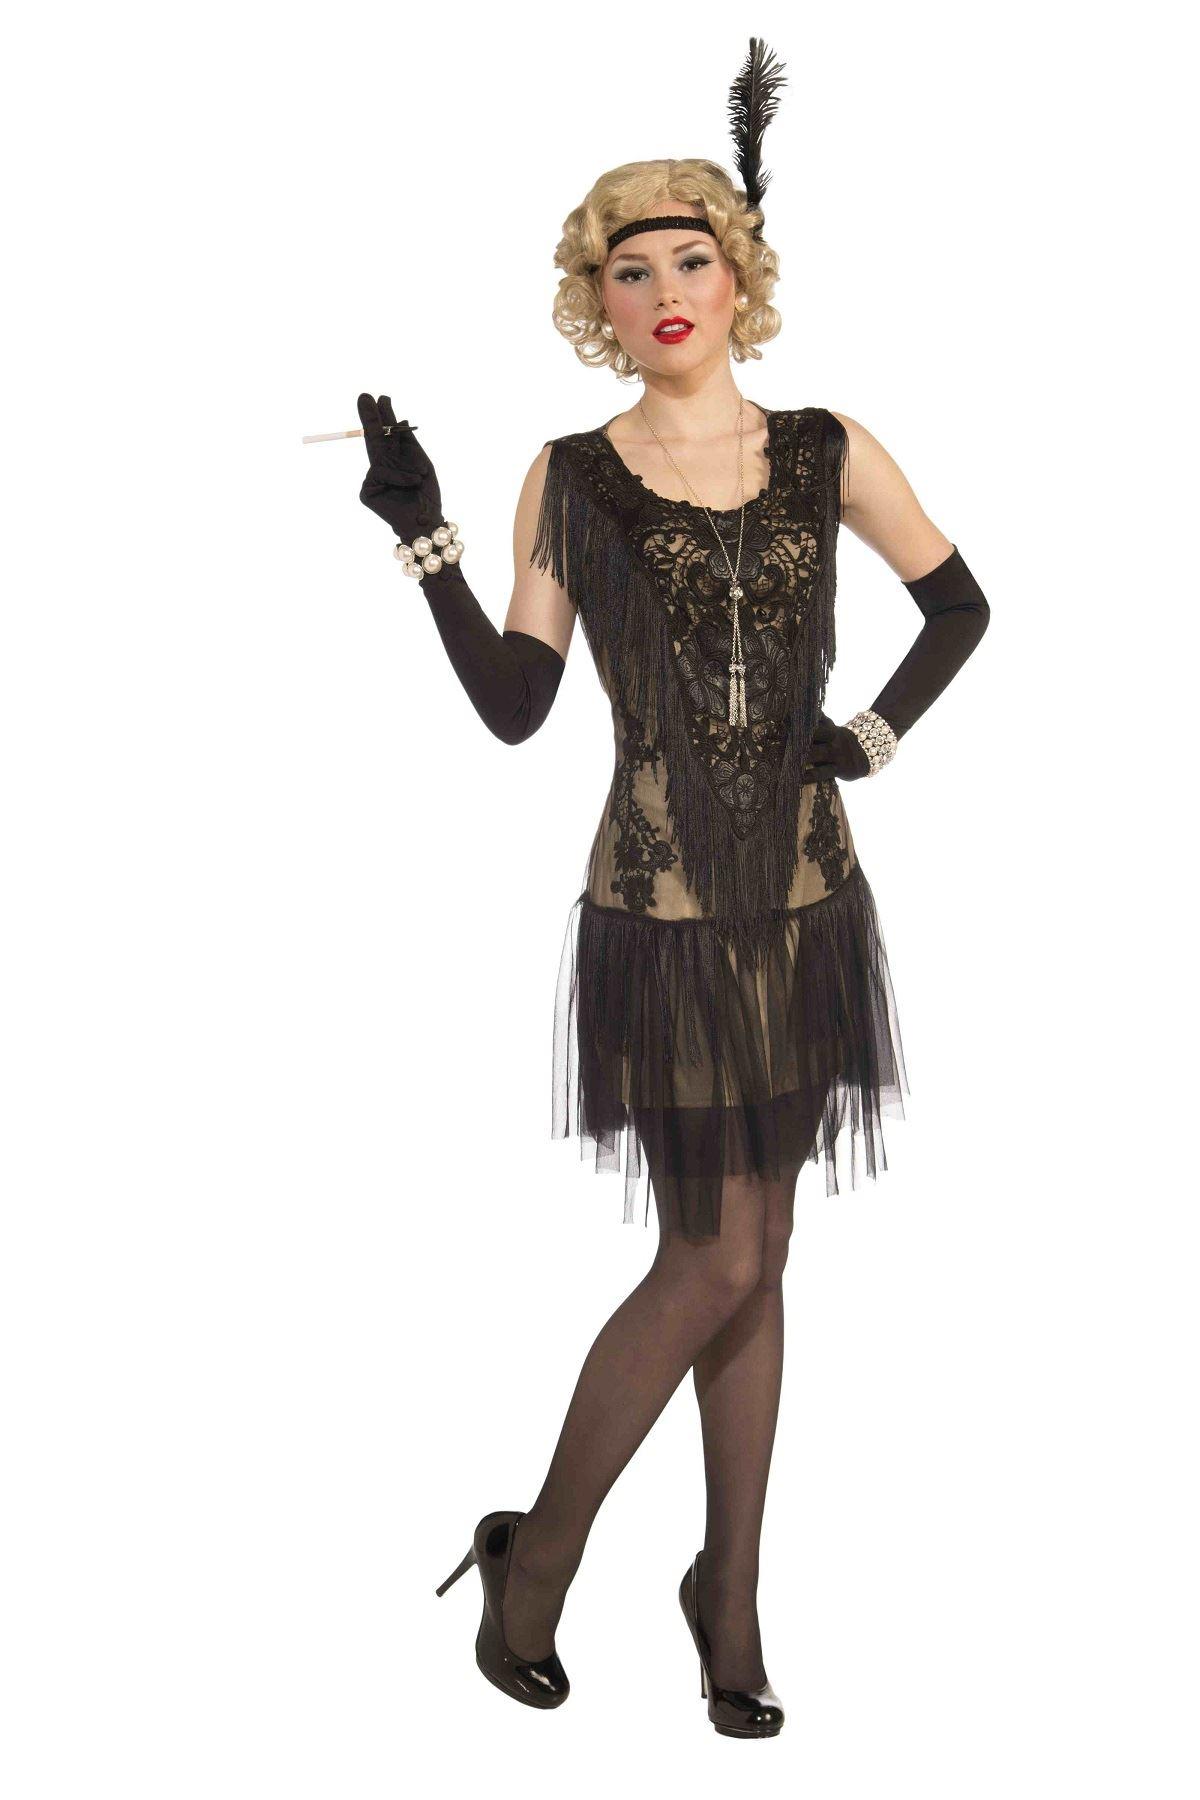 Roaring 20s Costumes For Halloween - HalloweenCostumes.com